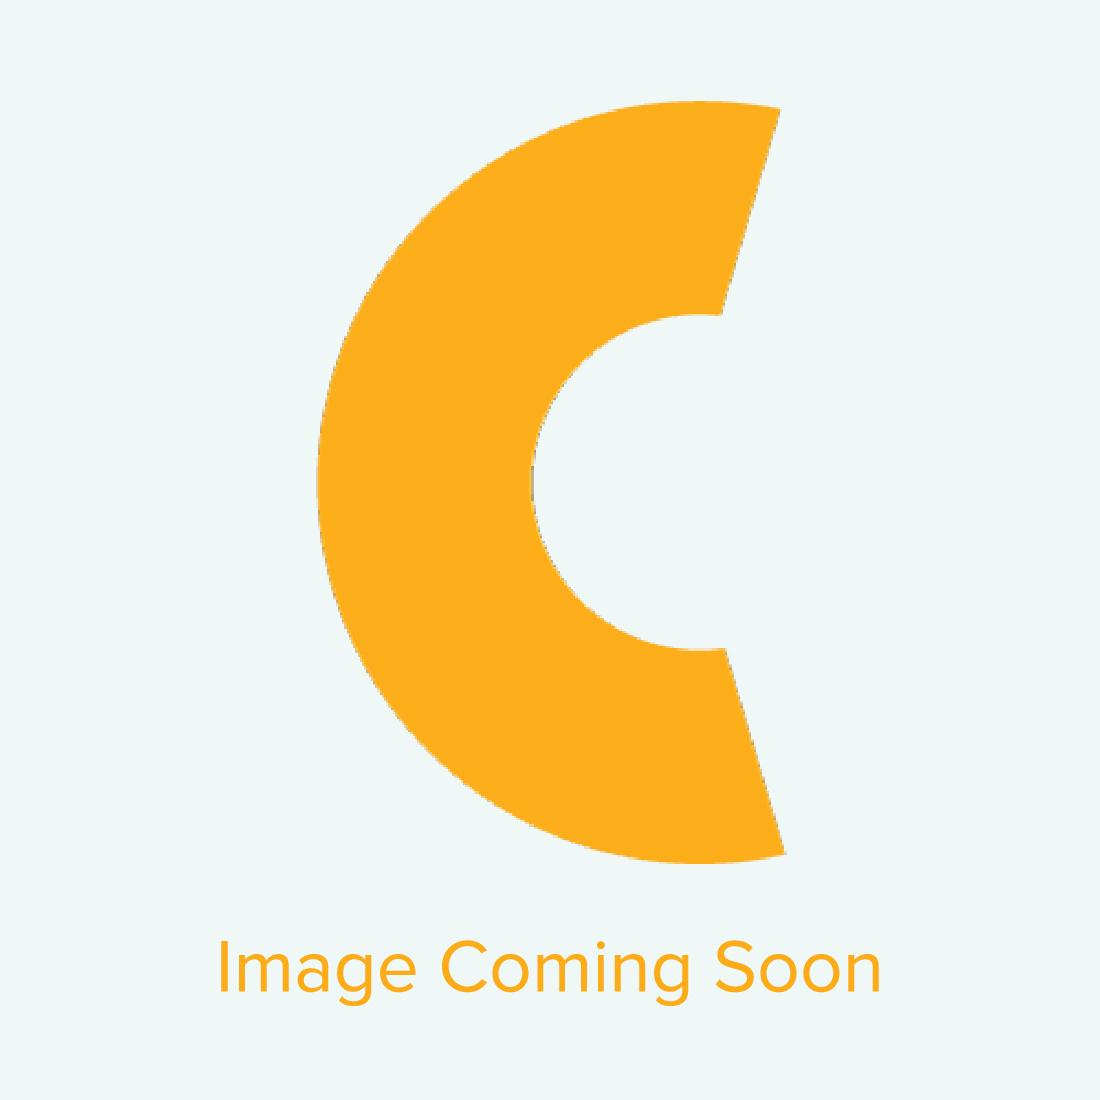 "Xpress Cut Heat Transfer Vinyl - 15"" x 25 yards"